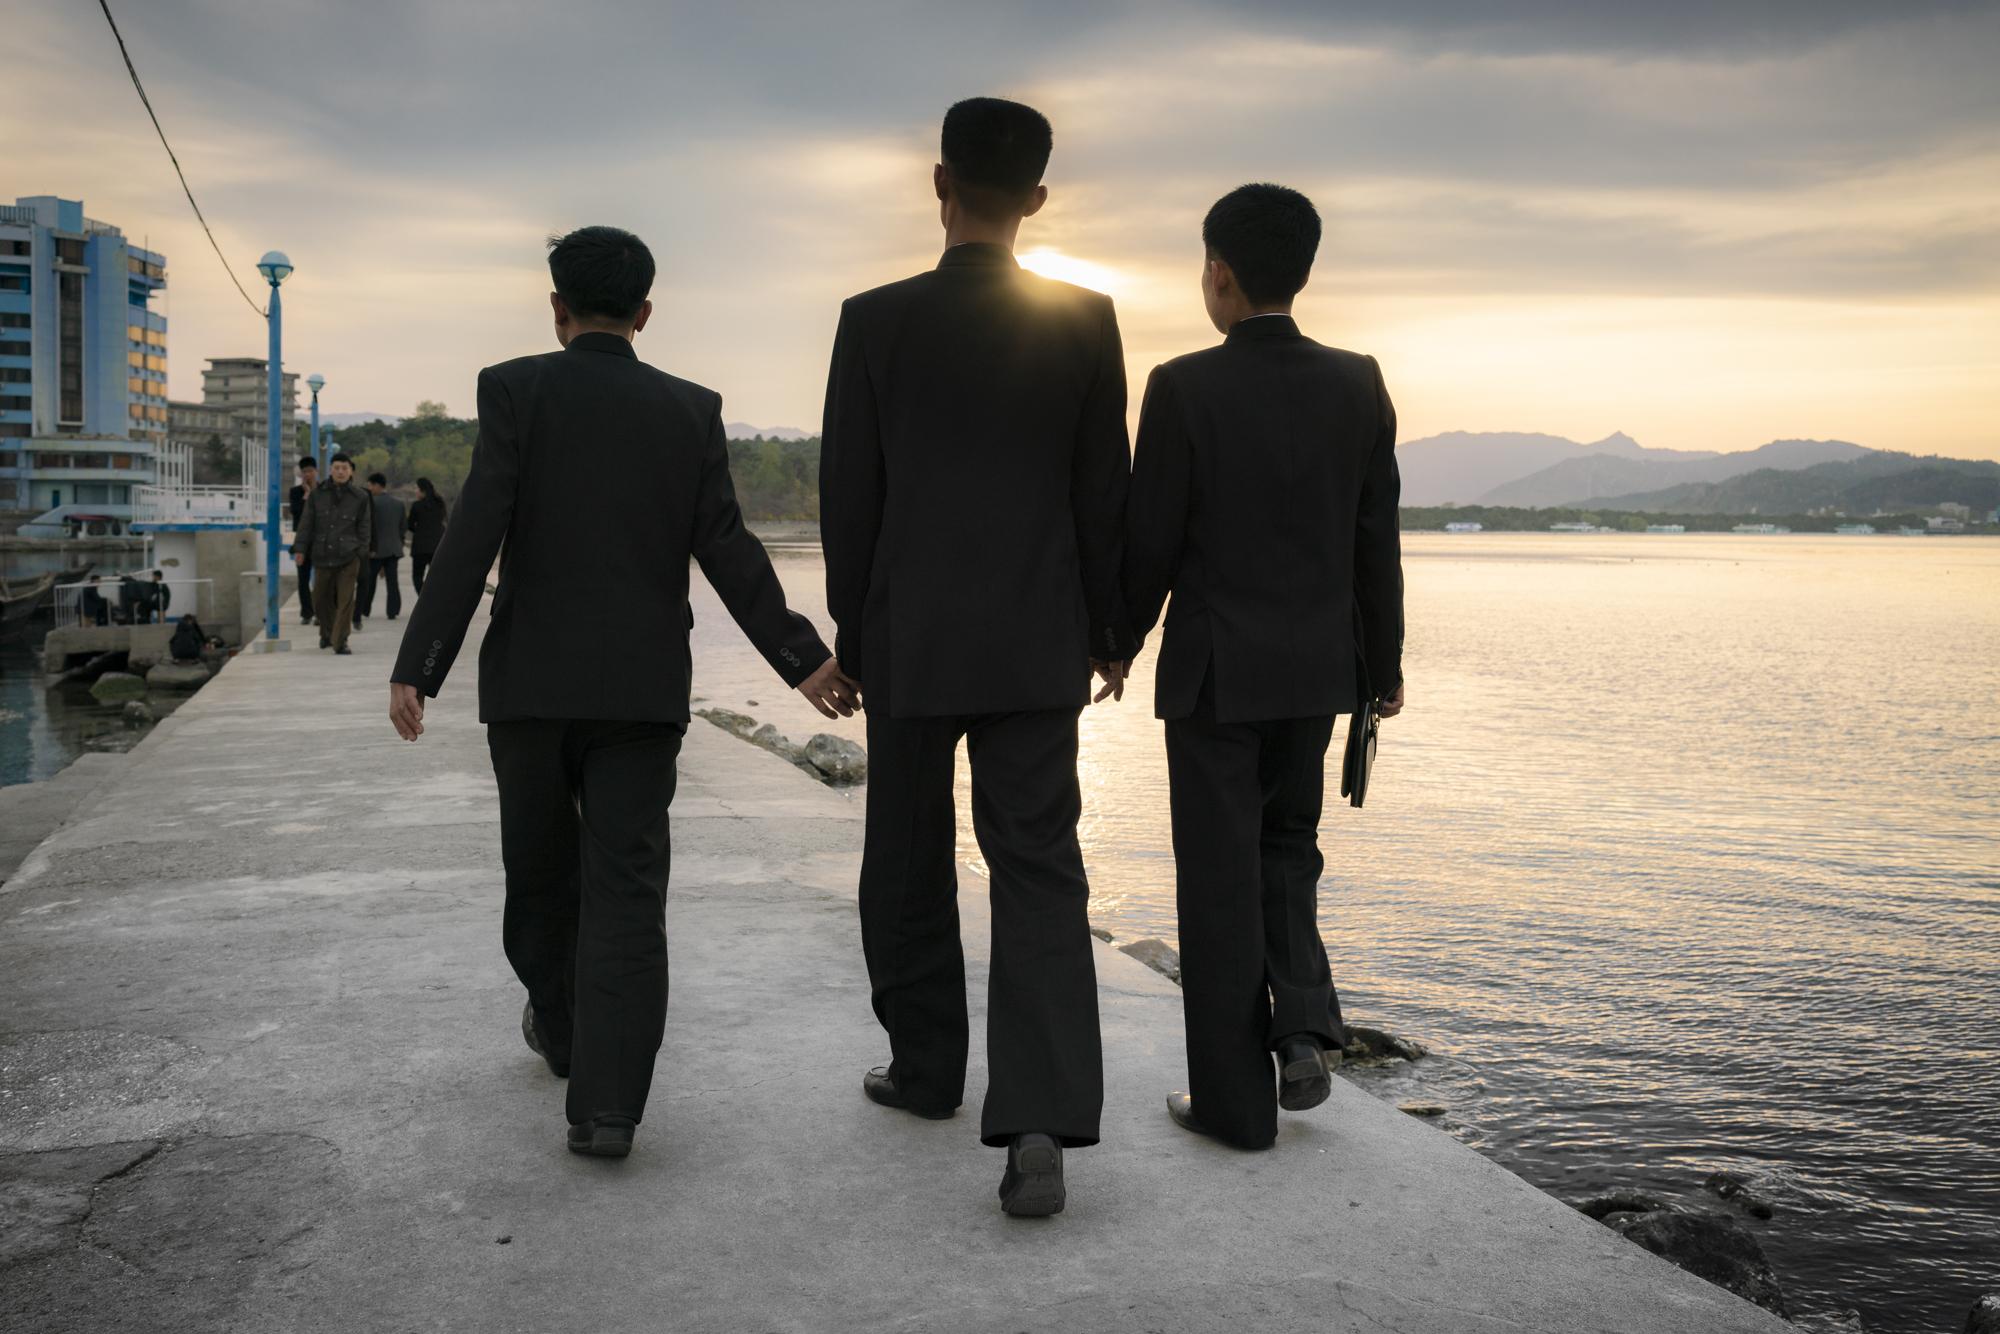 NorthKorea_160419_SNY2765_Web.jpg